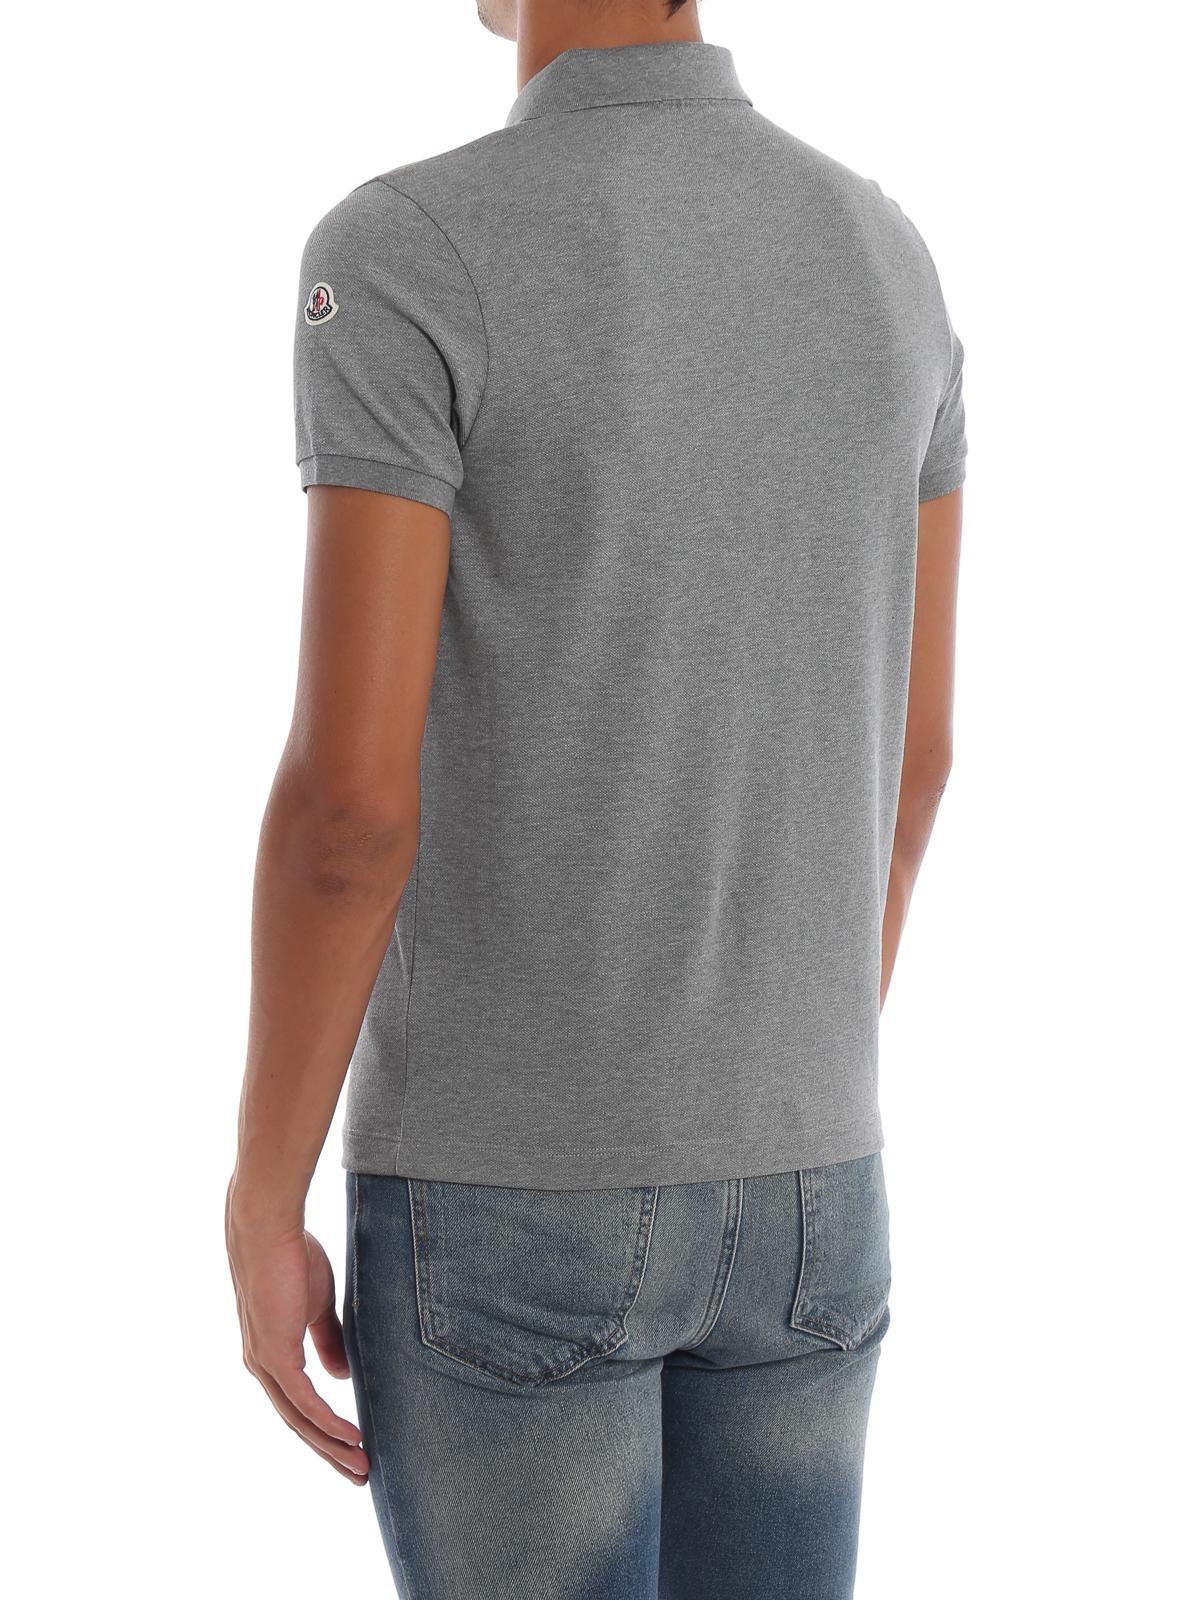 72ab7aa6b Moncler - Stone grey cotton polo shirt - polo shirts - D2 091 ...